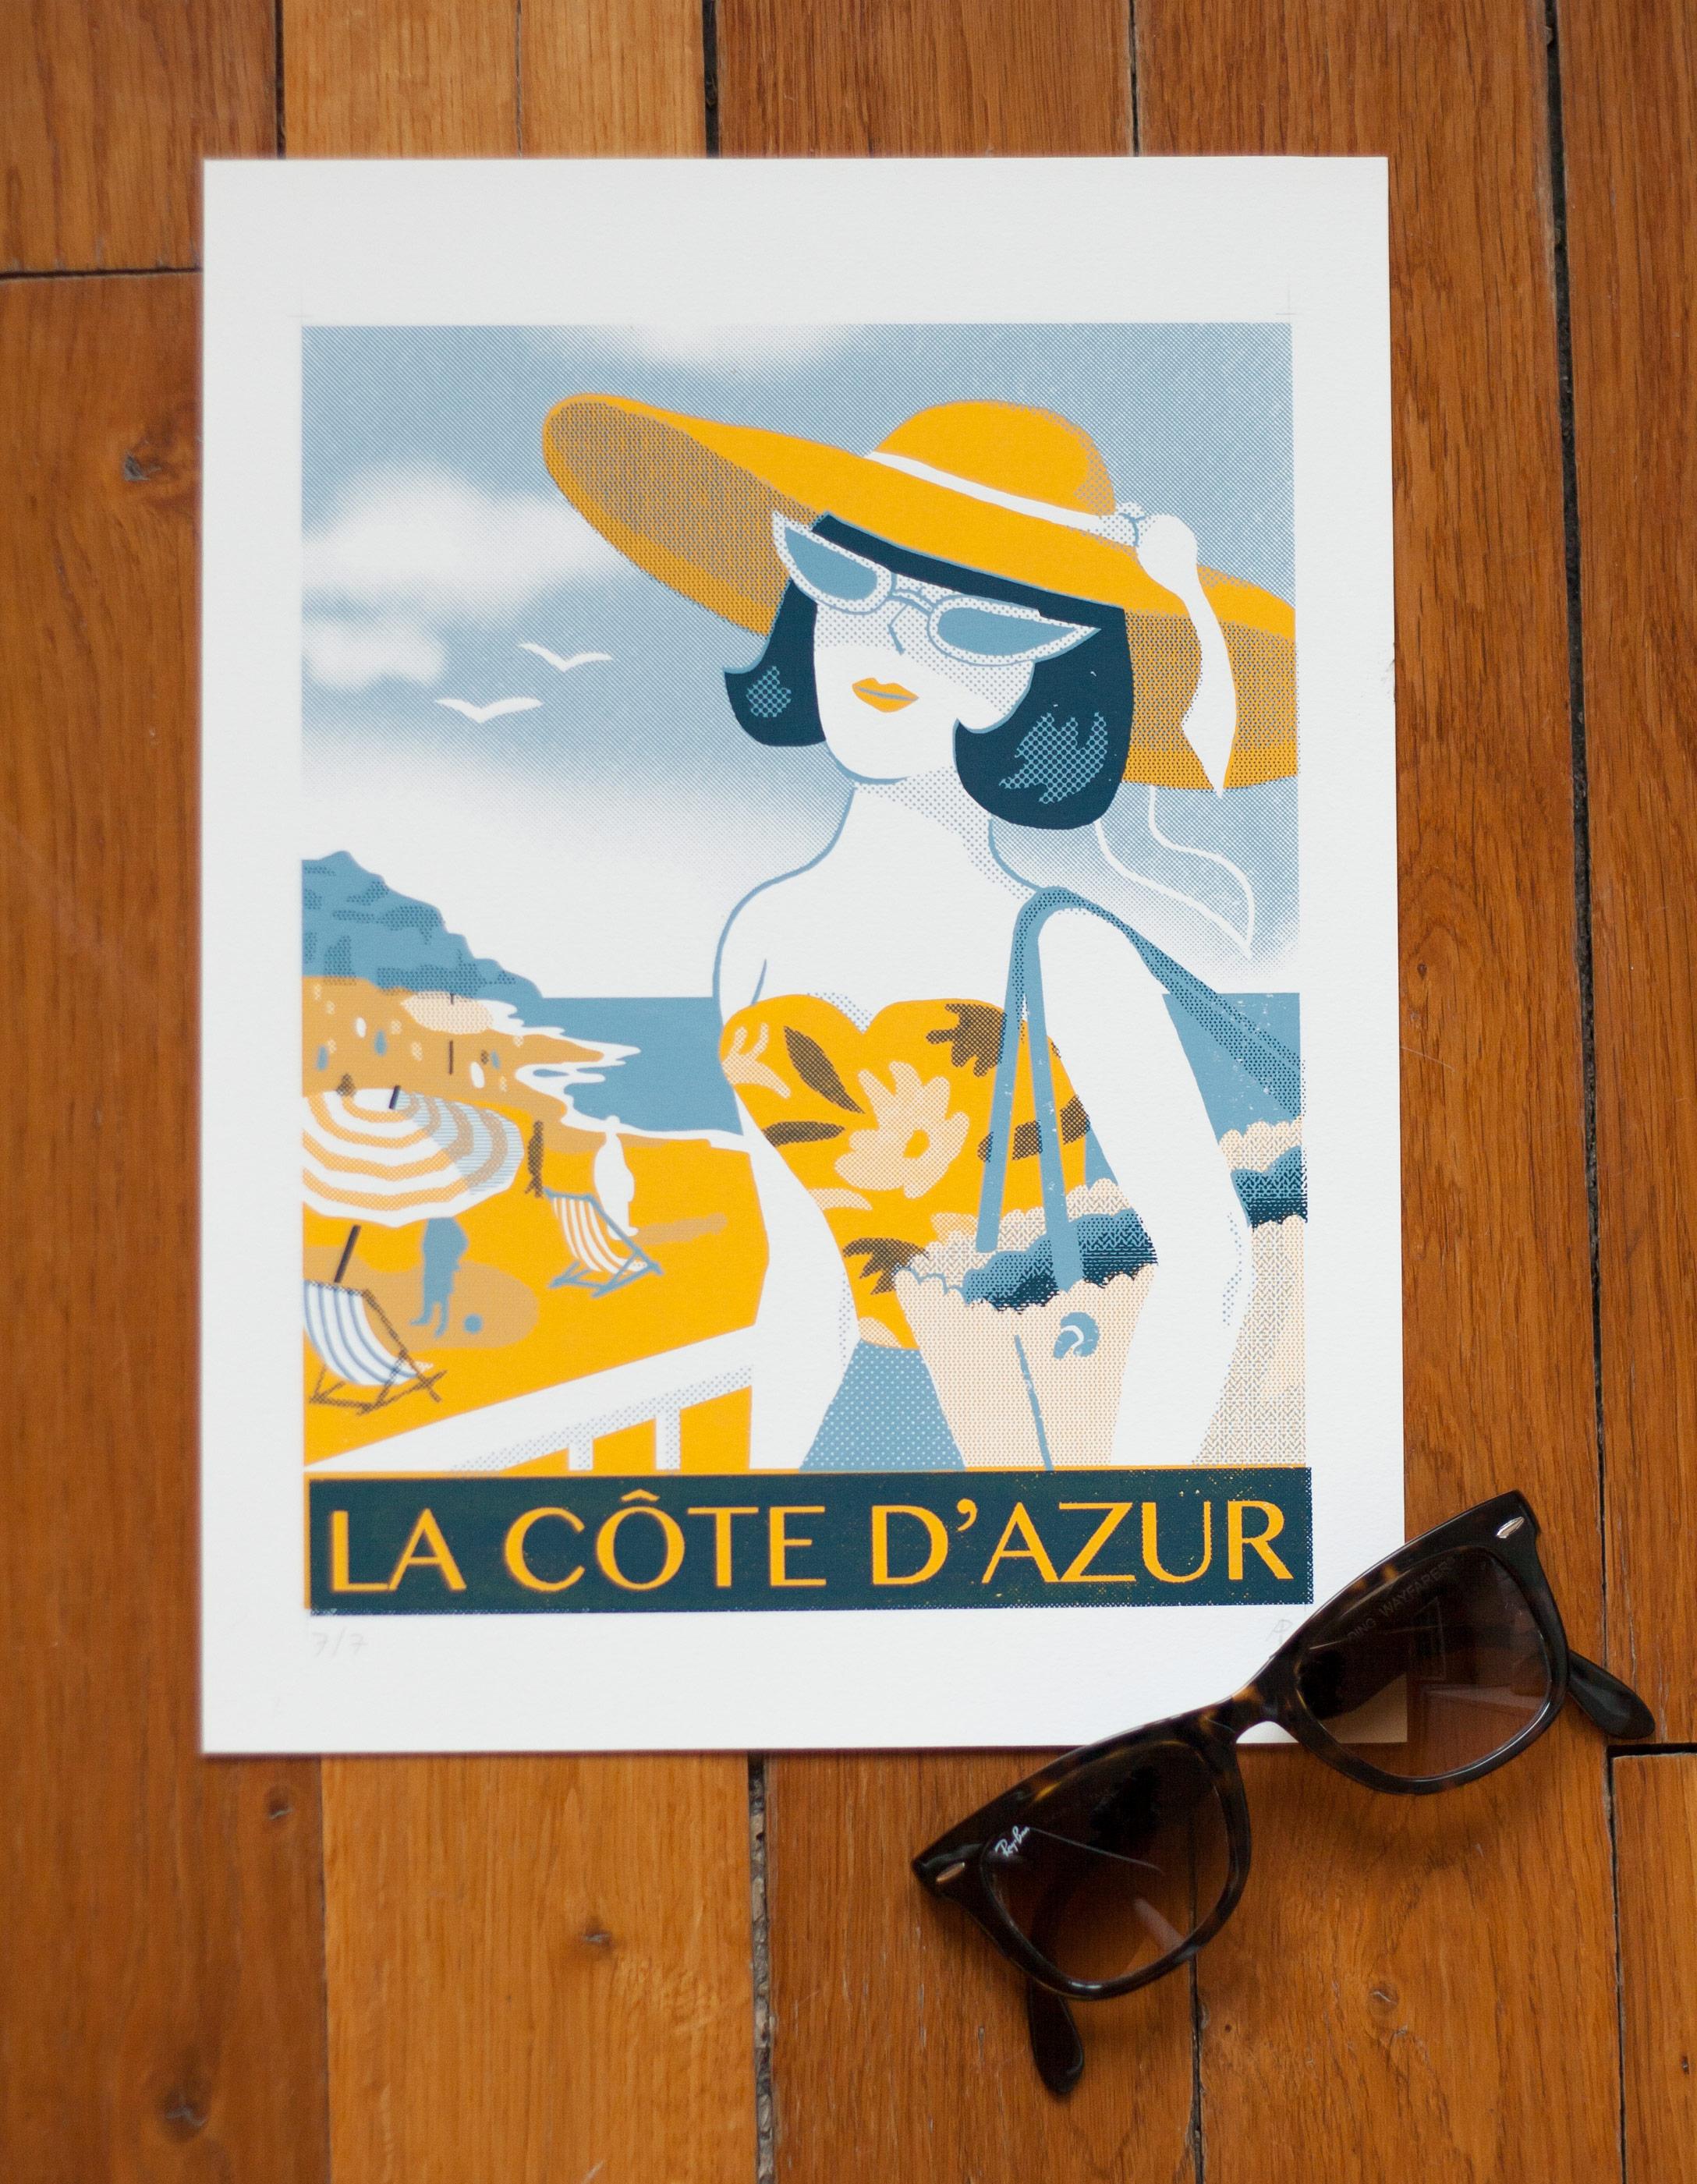 Annalisa Papagna illustration - La Côte d'Azur, screen-print in three colors